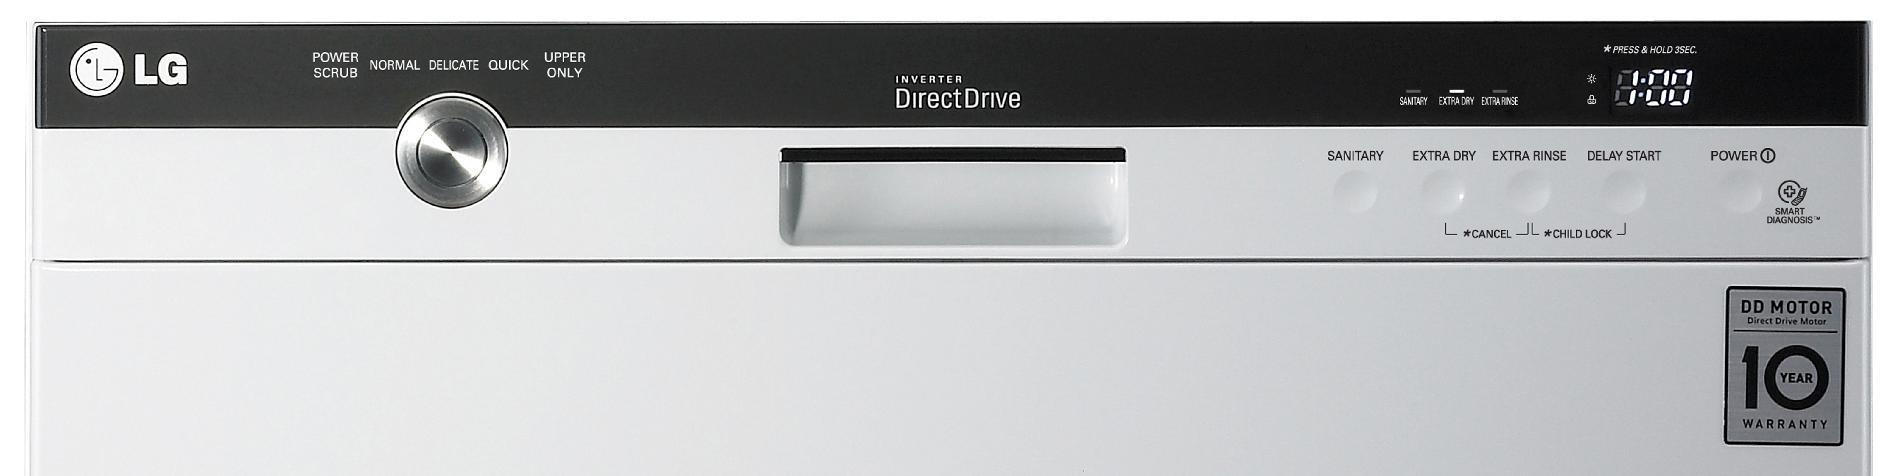 "LG 24"" Built-In Dishwasher w/ EasyRack™ Plus System - White"